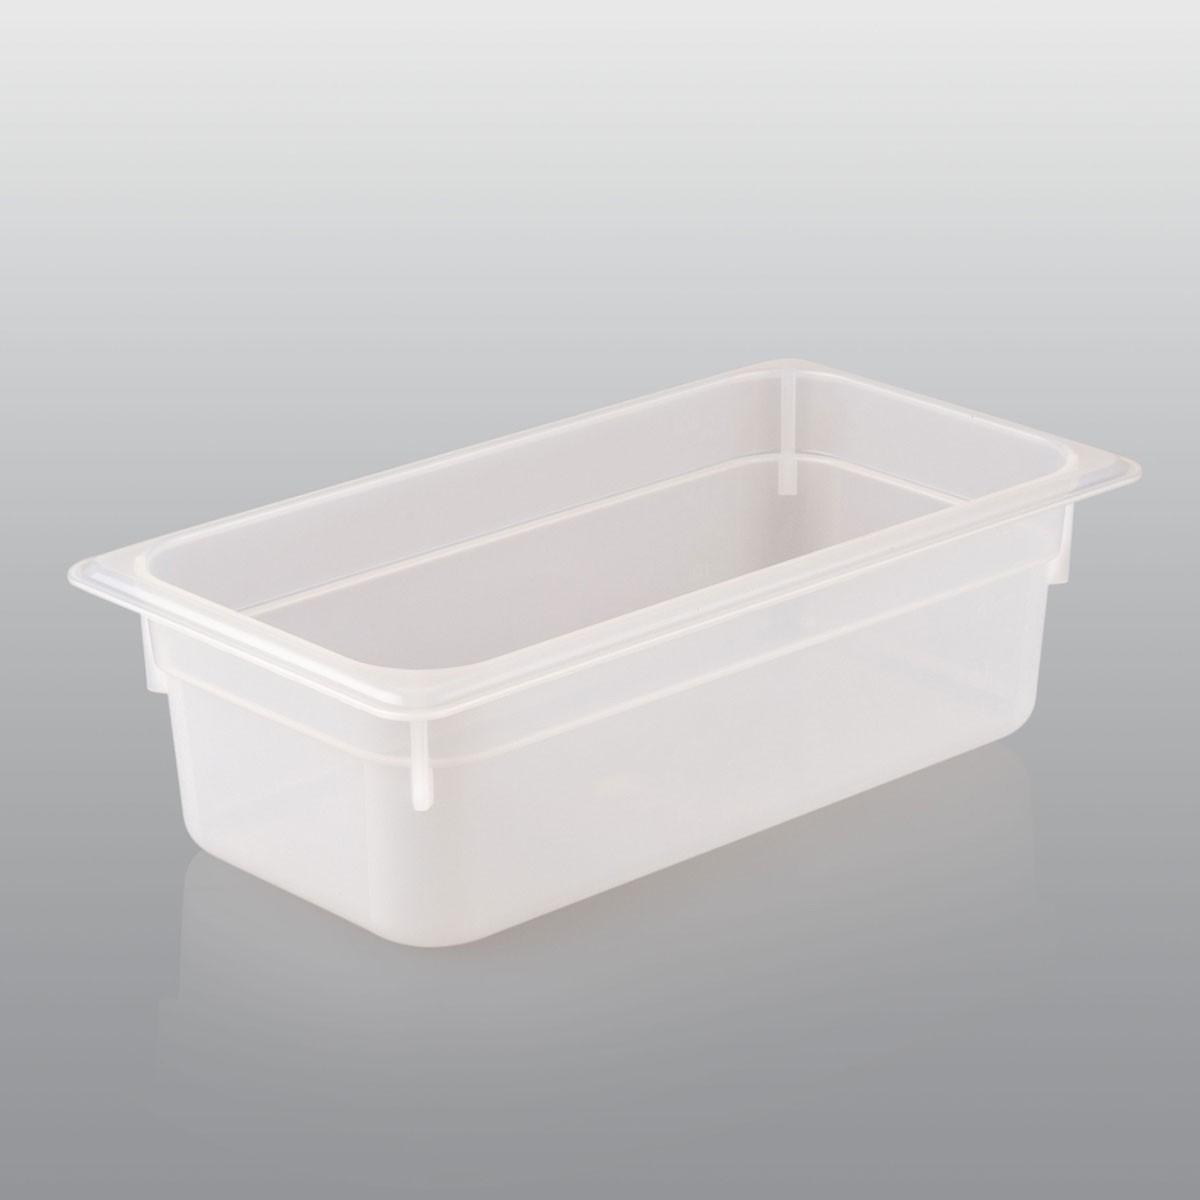 GN Behälter GN 1/3 aus Polypropylen (Tiefe: 100mm) 4,0 L Saro